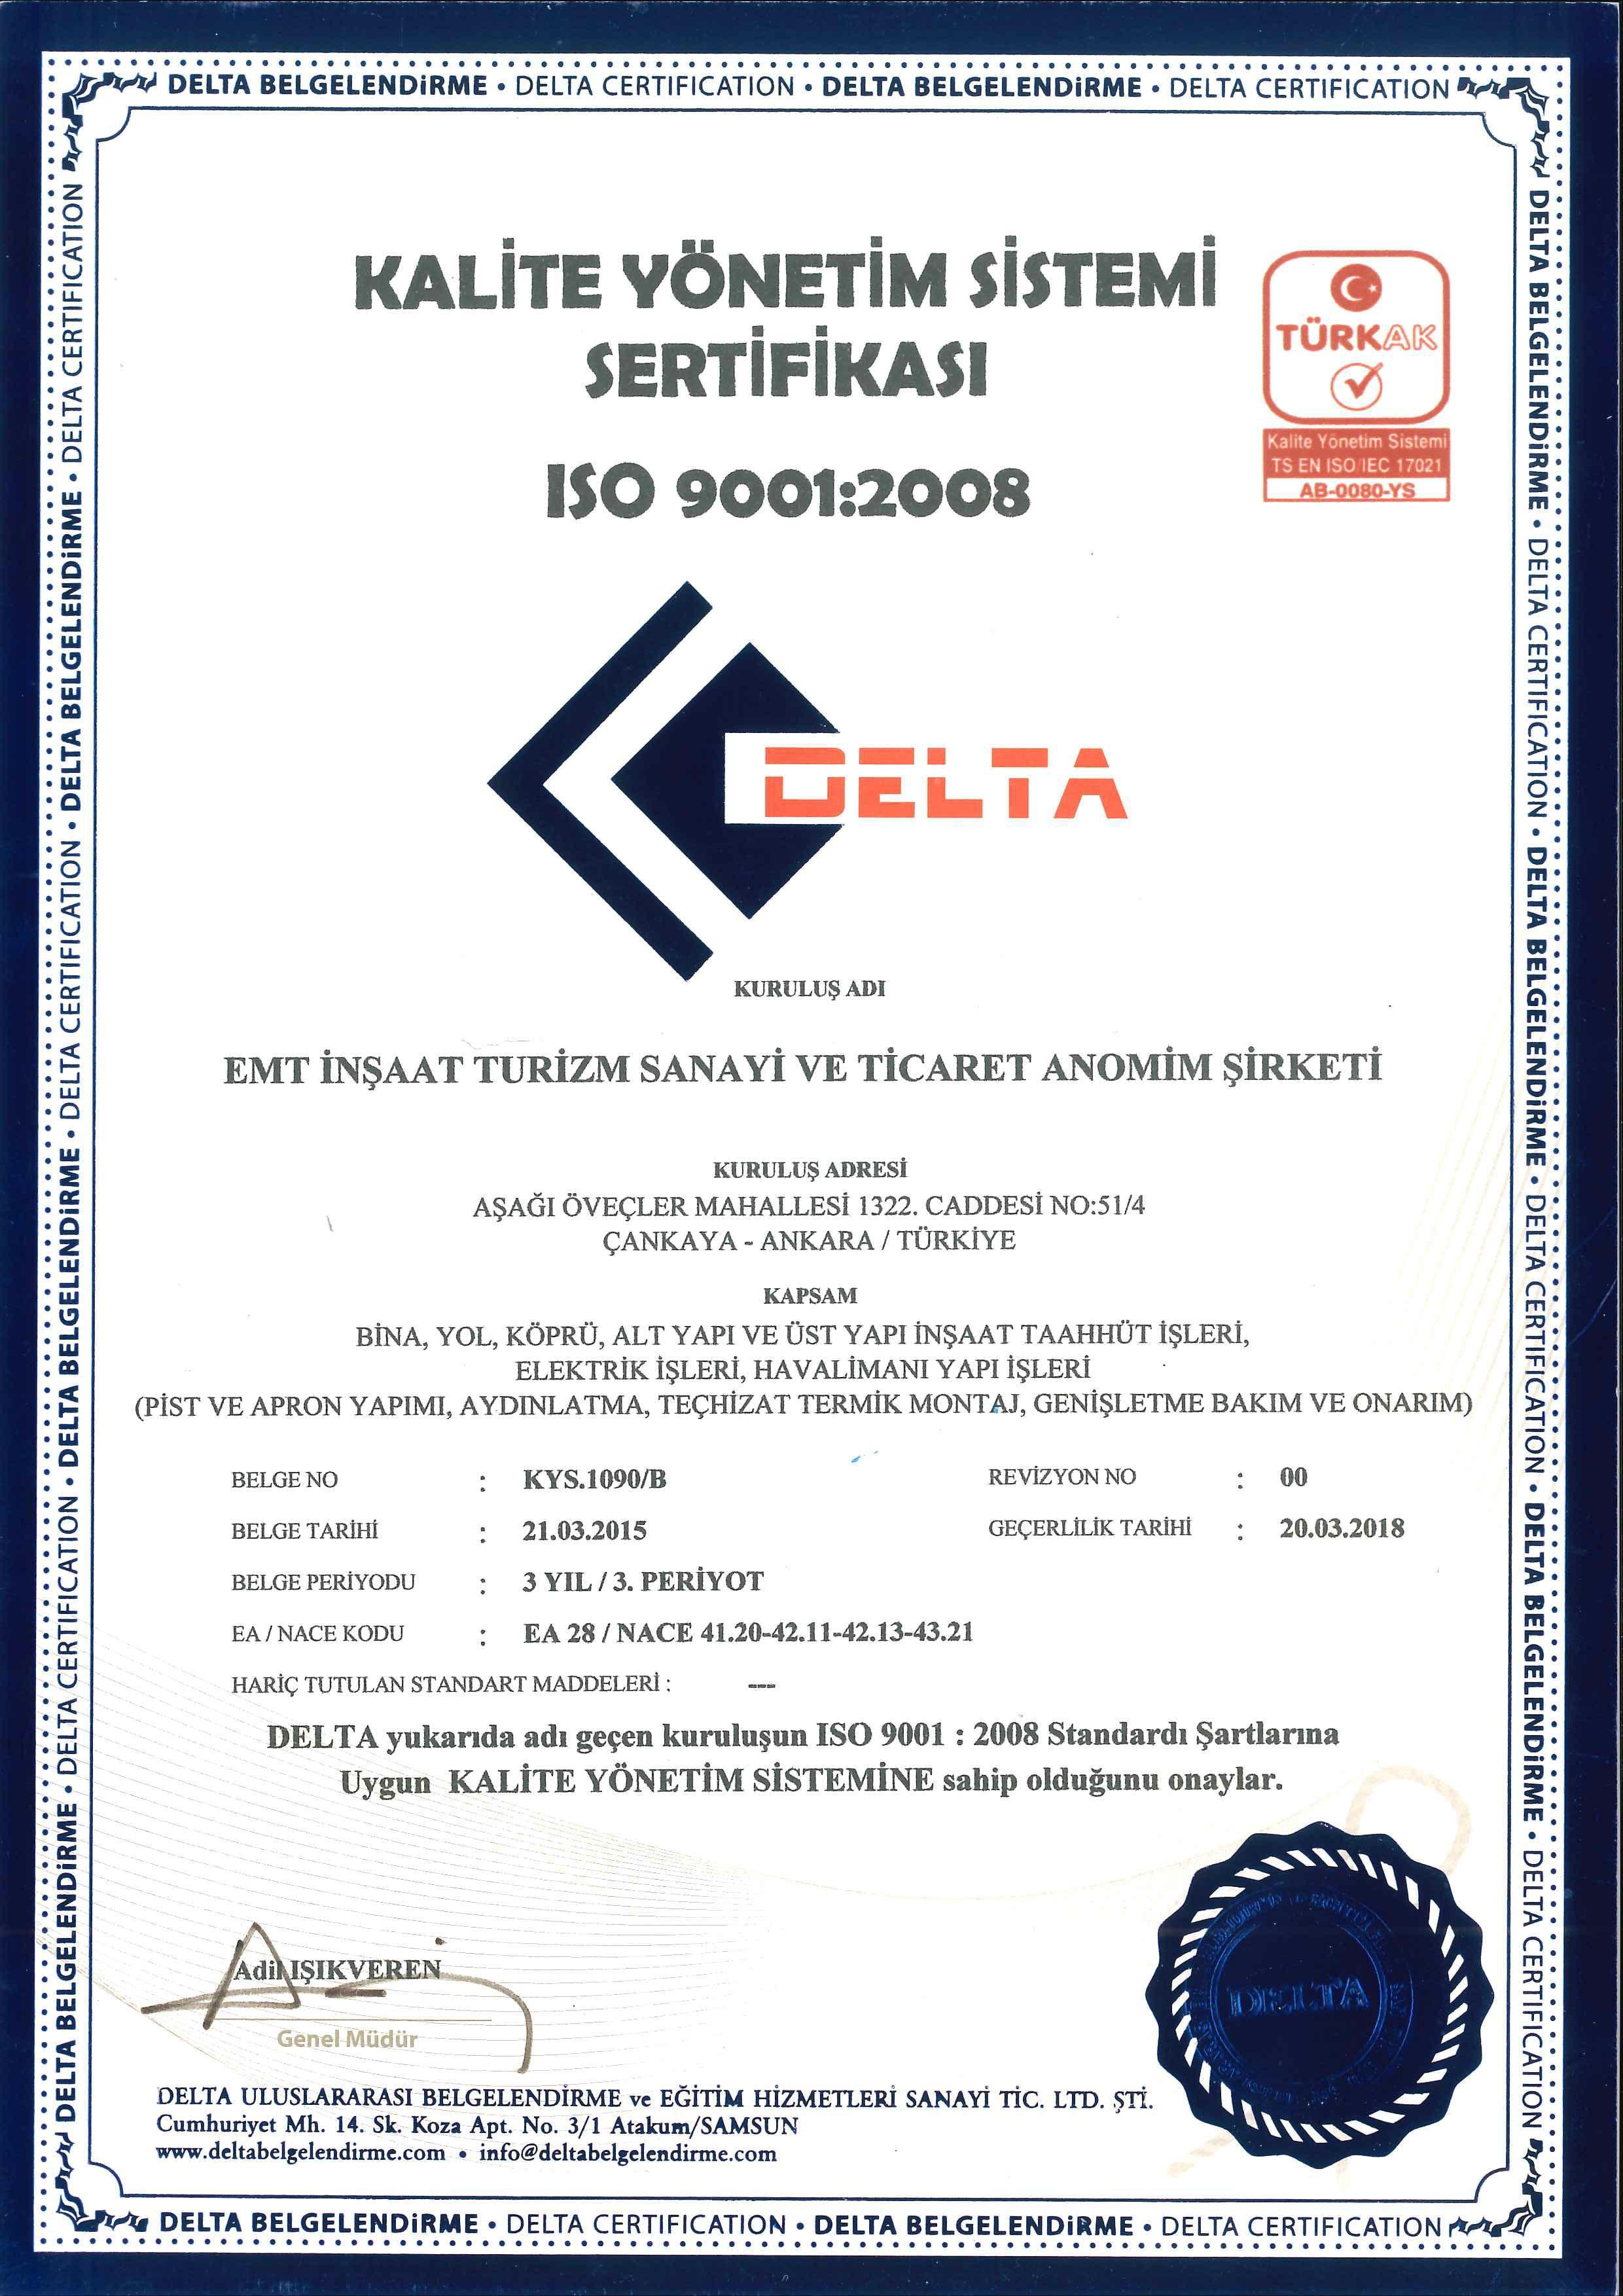 KALİTE YÖNETİM SİSTEMİ SERTİFİKASI ISO 9001:2008